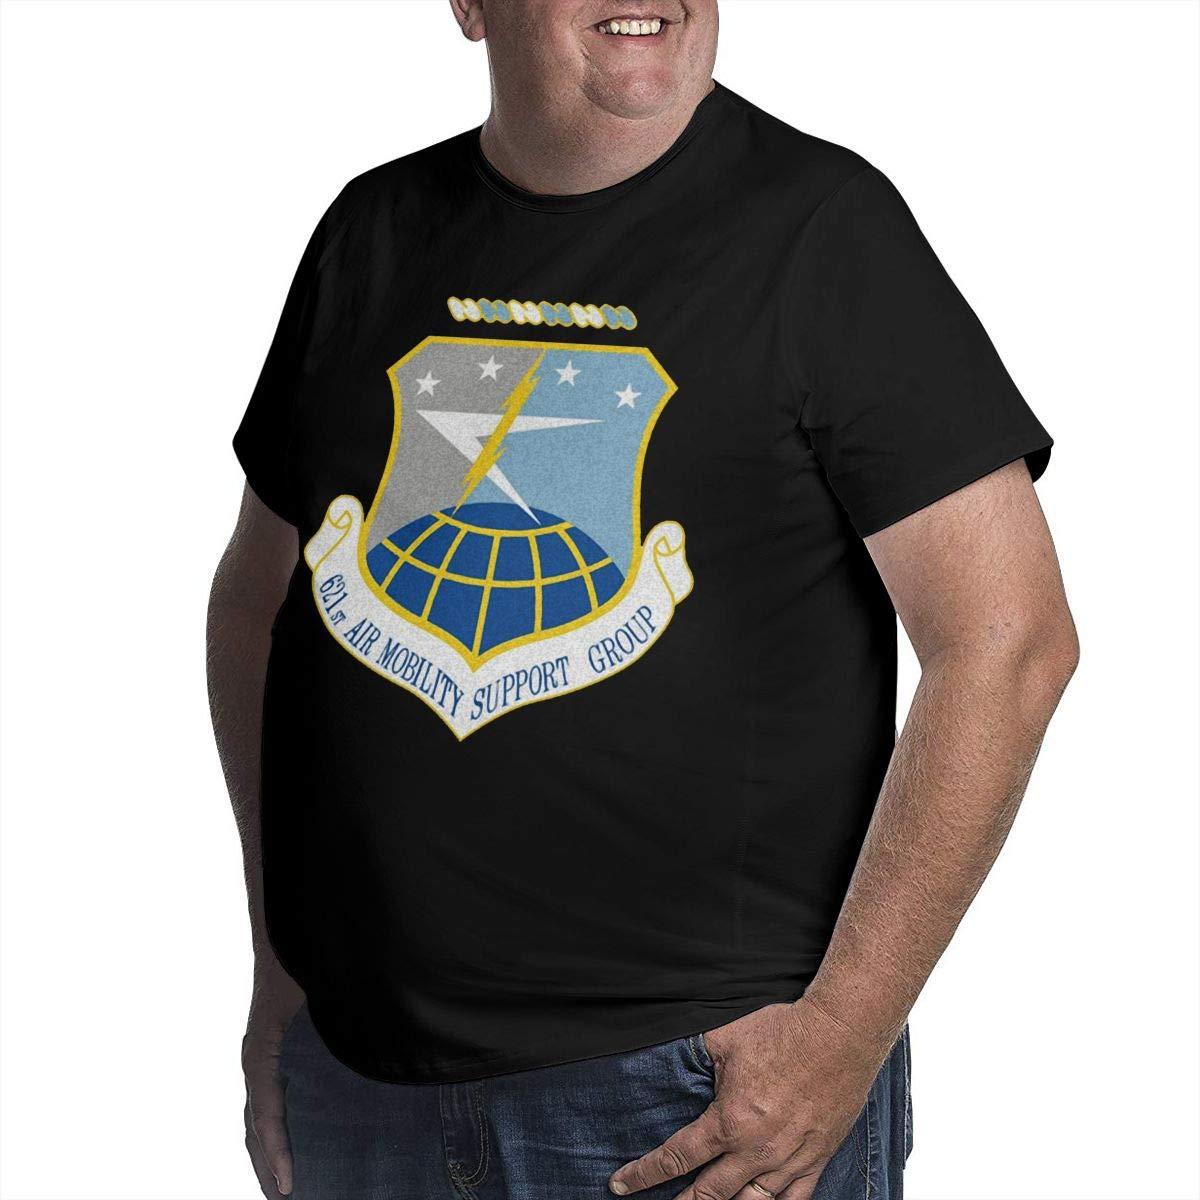 YONGCHOO JR Air Force 621st Air Mobility Support Group Mens Short Sleeve T-Shirt Big /& Tall Heavyweight T-Shirt